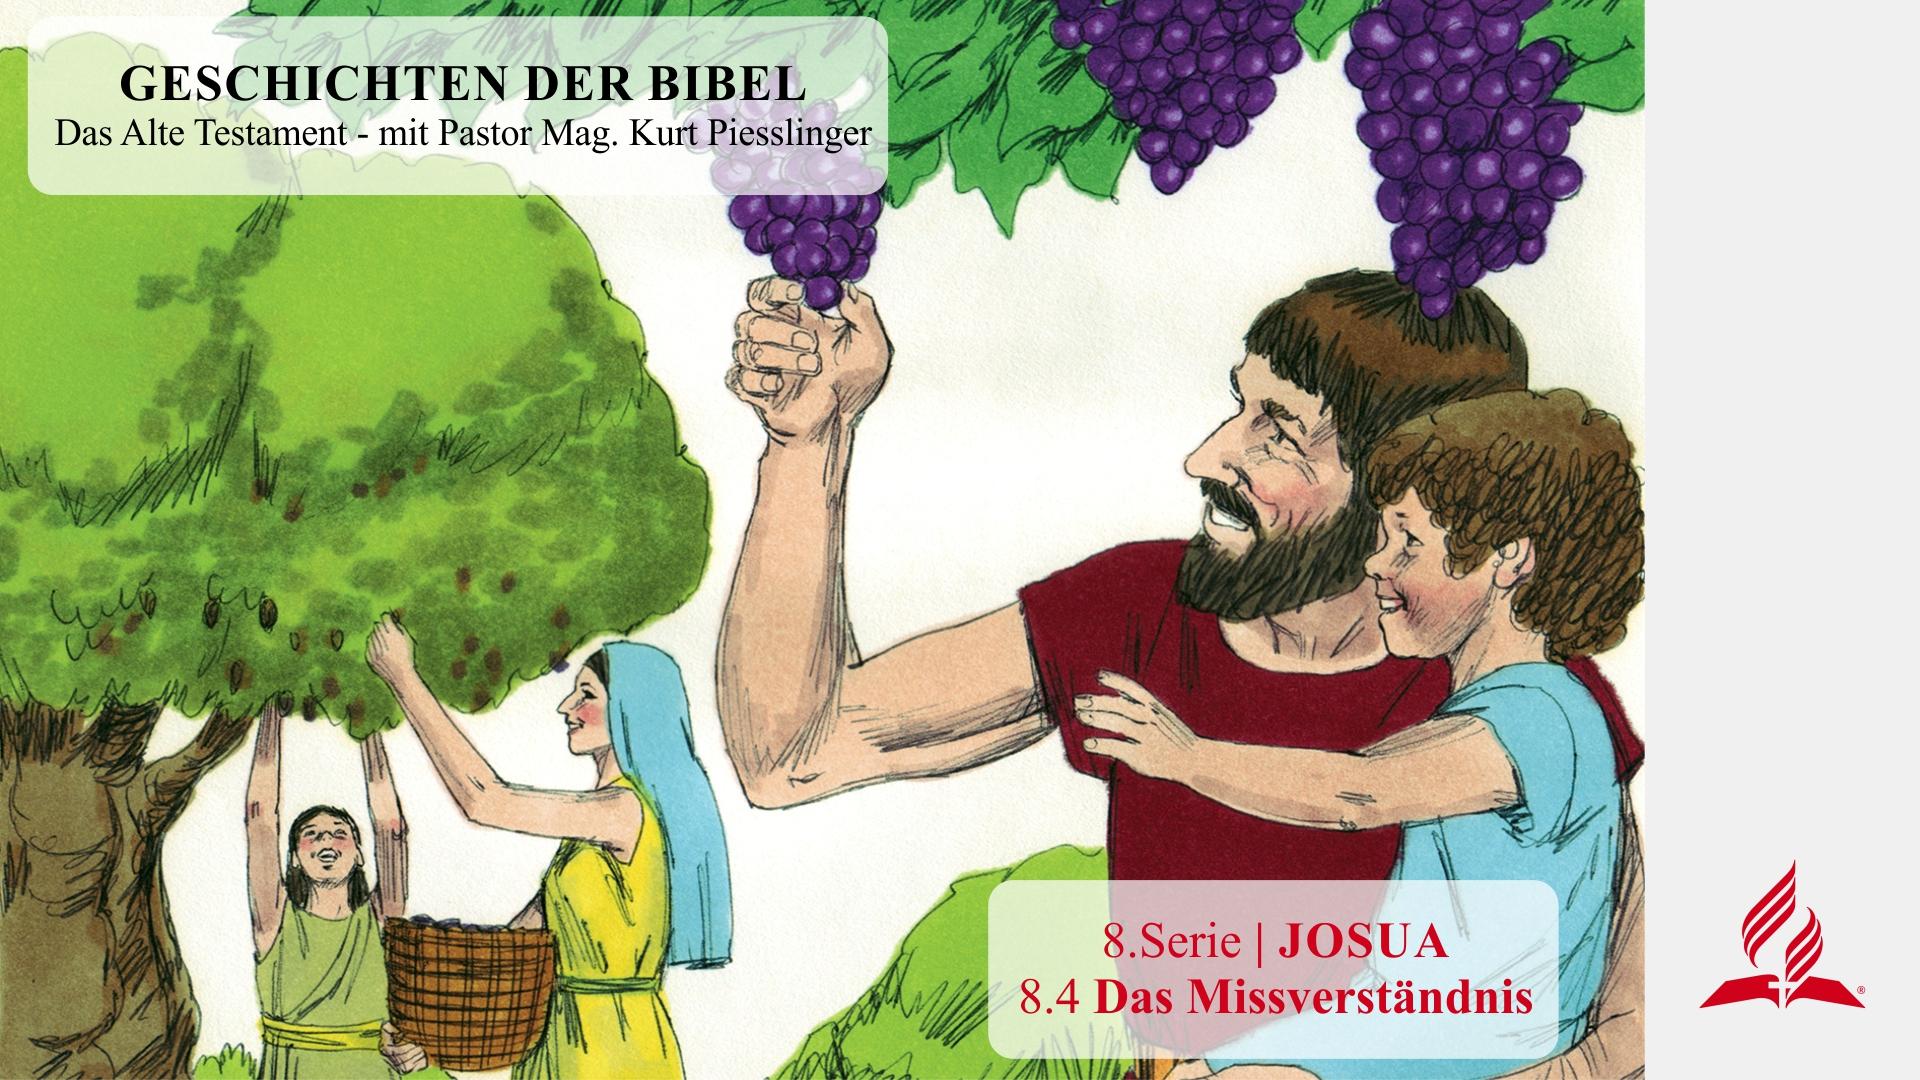 GESCHICHTEN DER BIBEL: 8.4 Das Missverständnis – 8.JOSUA | Pastor Mag. Kurt Piesslinger